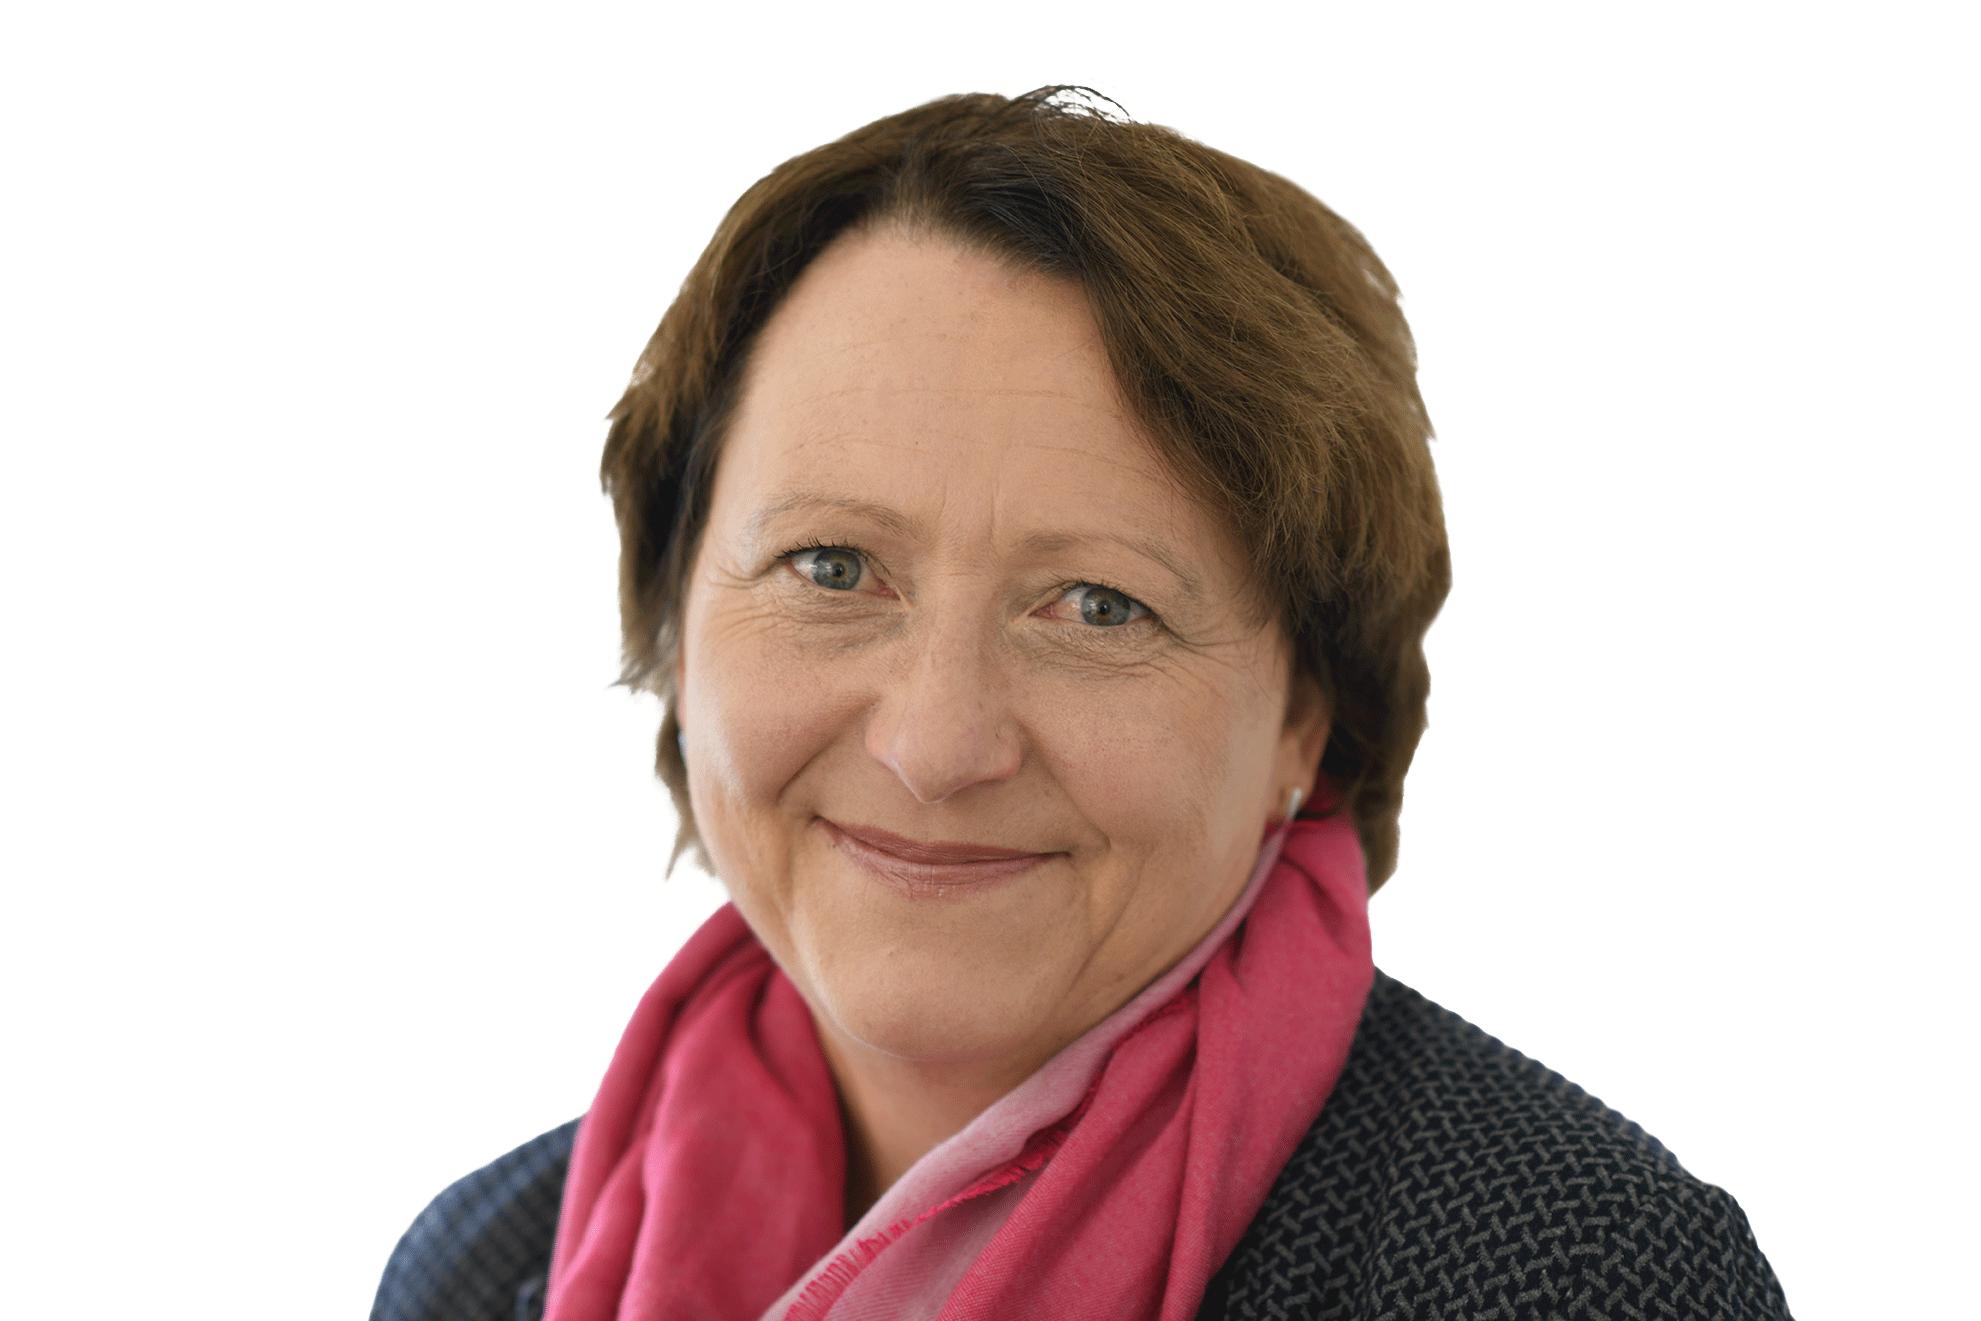 Silvia Wiethoff